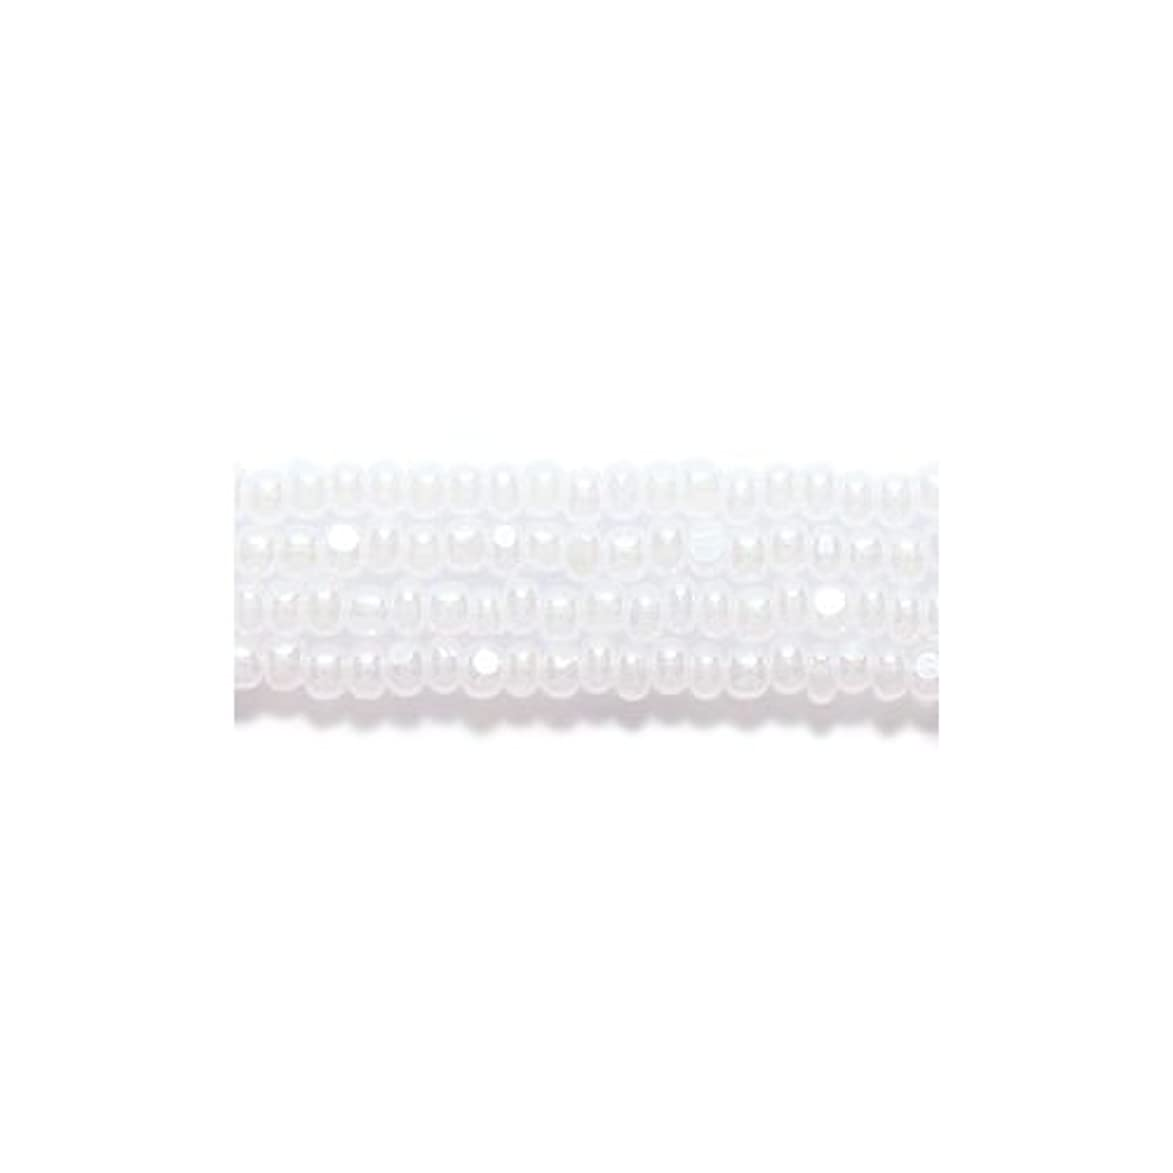 Preciosa Ornela Czech Seed Bead, True Cut Pearl White, Size 11/0 wqn390111859764